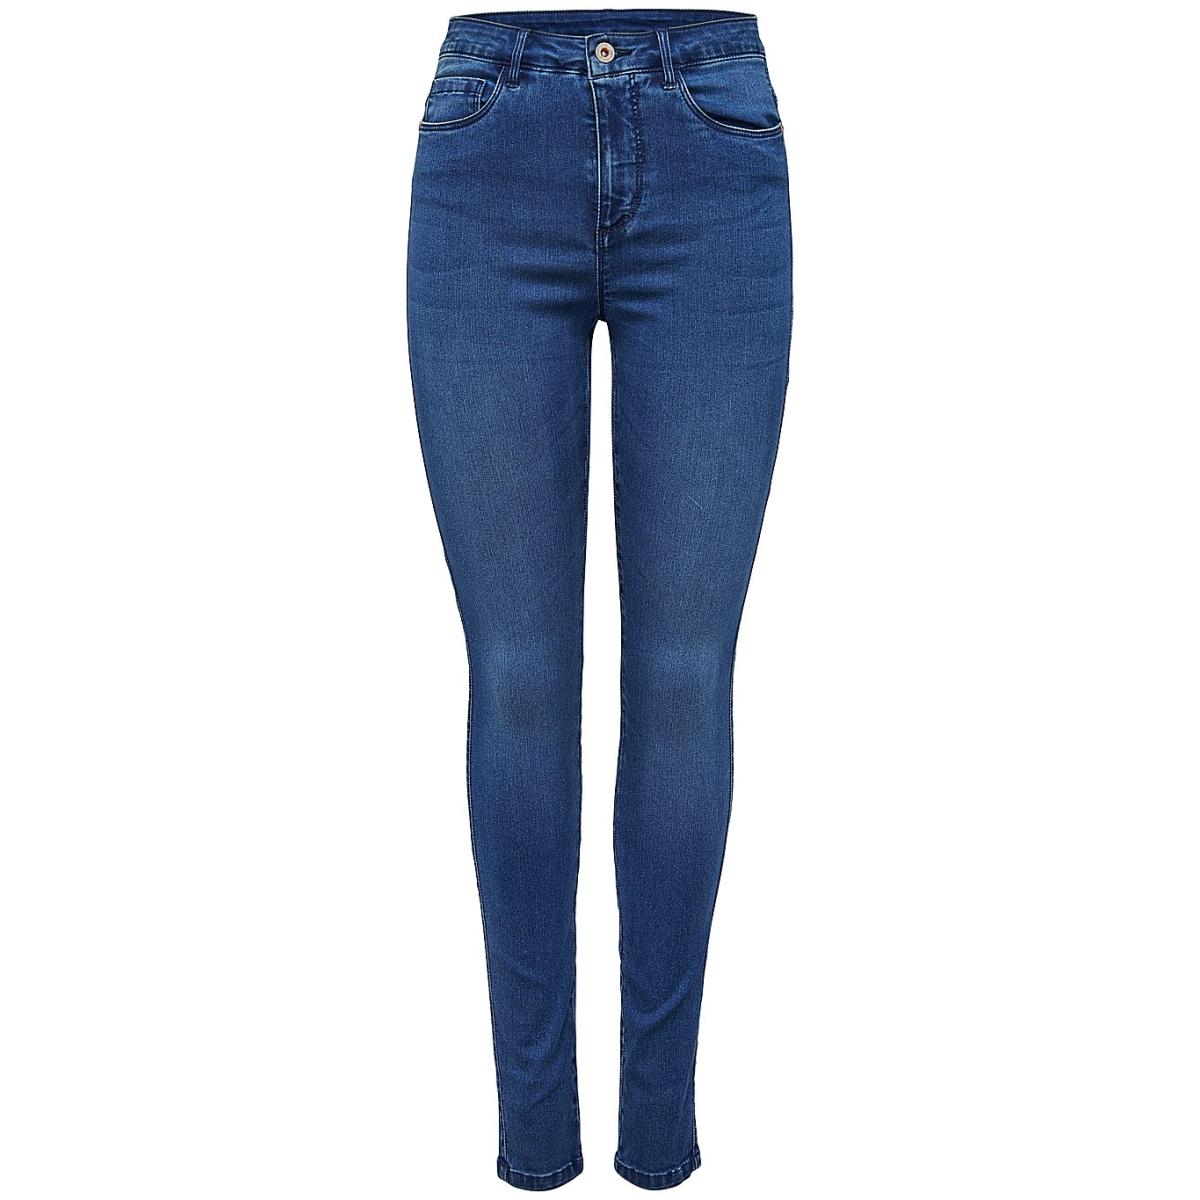 onlroyal high w.skinny jeans pim504 15097919 only jeans medium blue denim